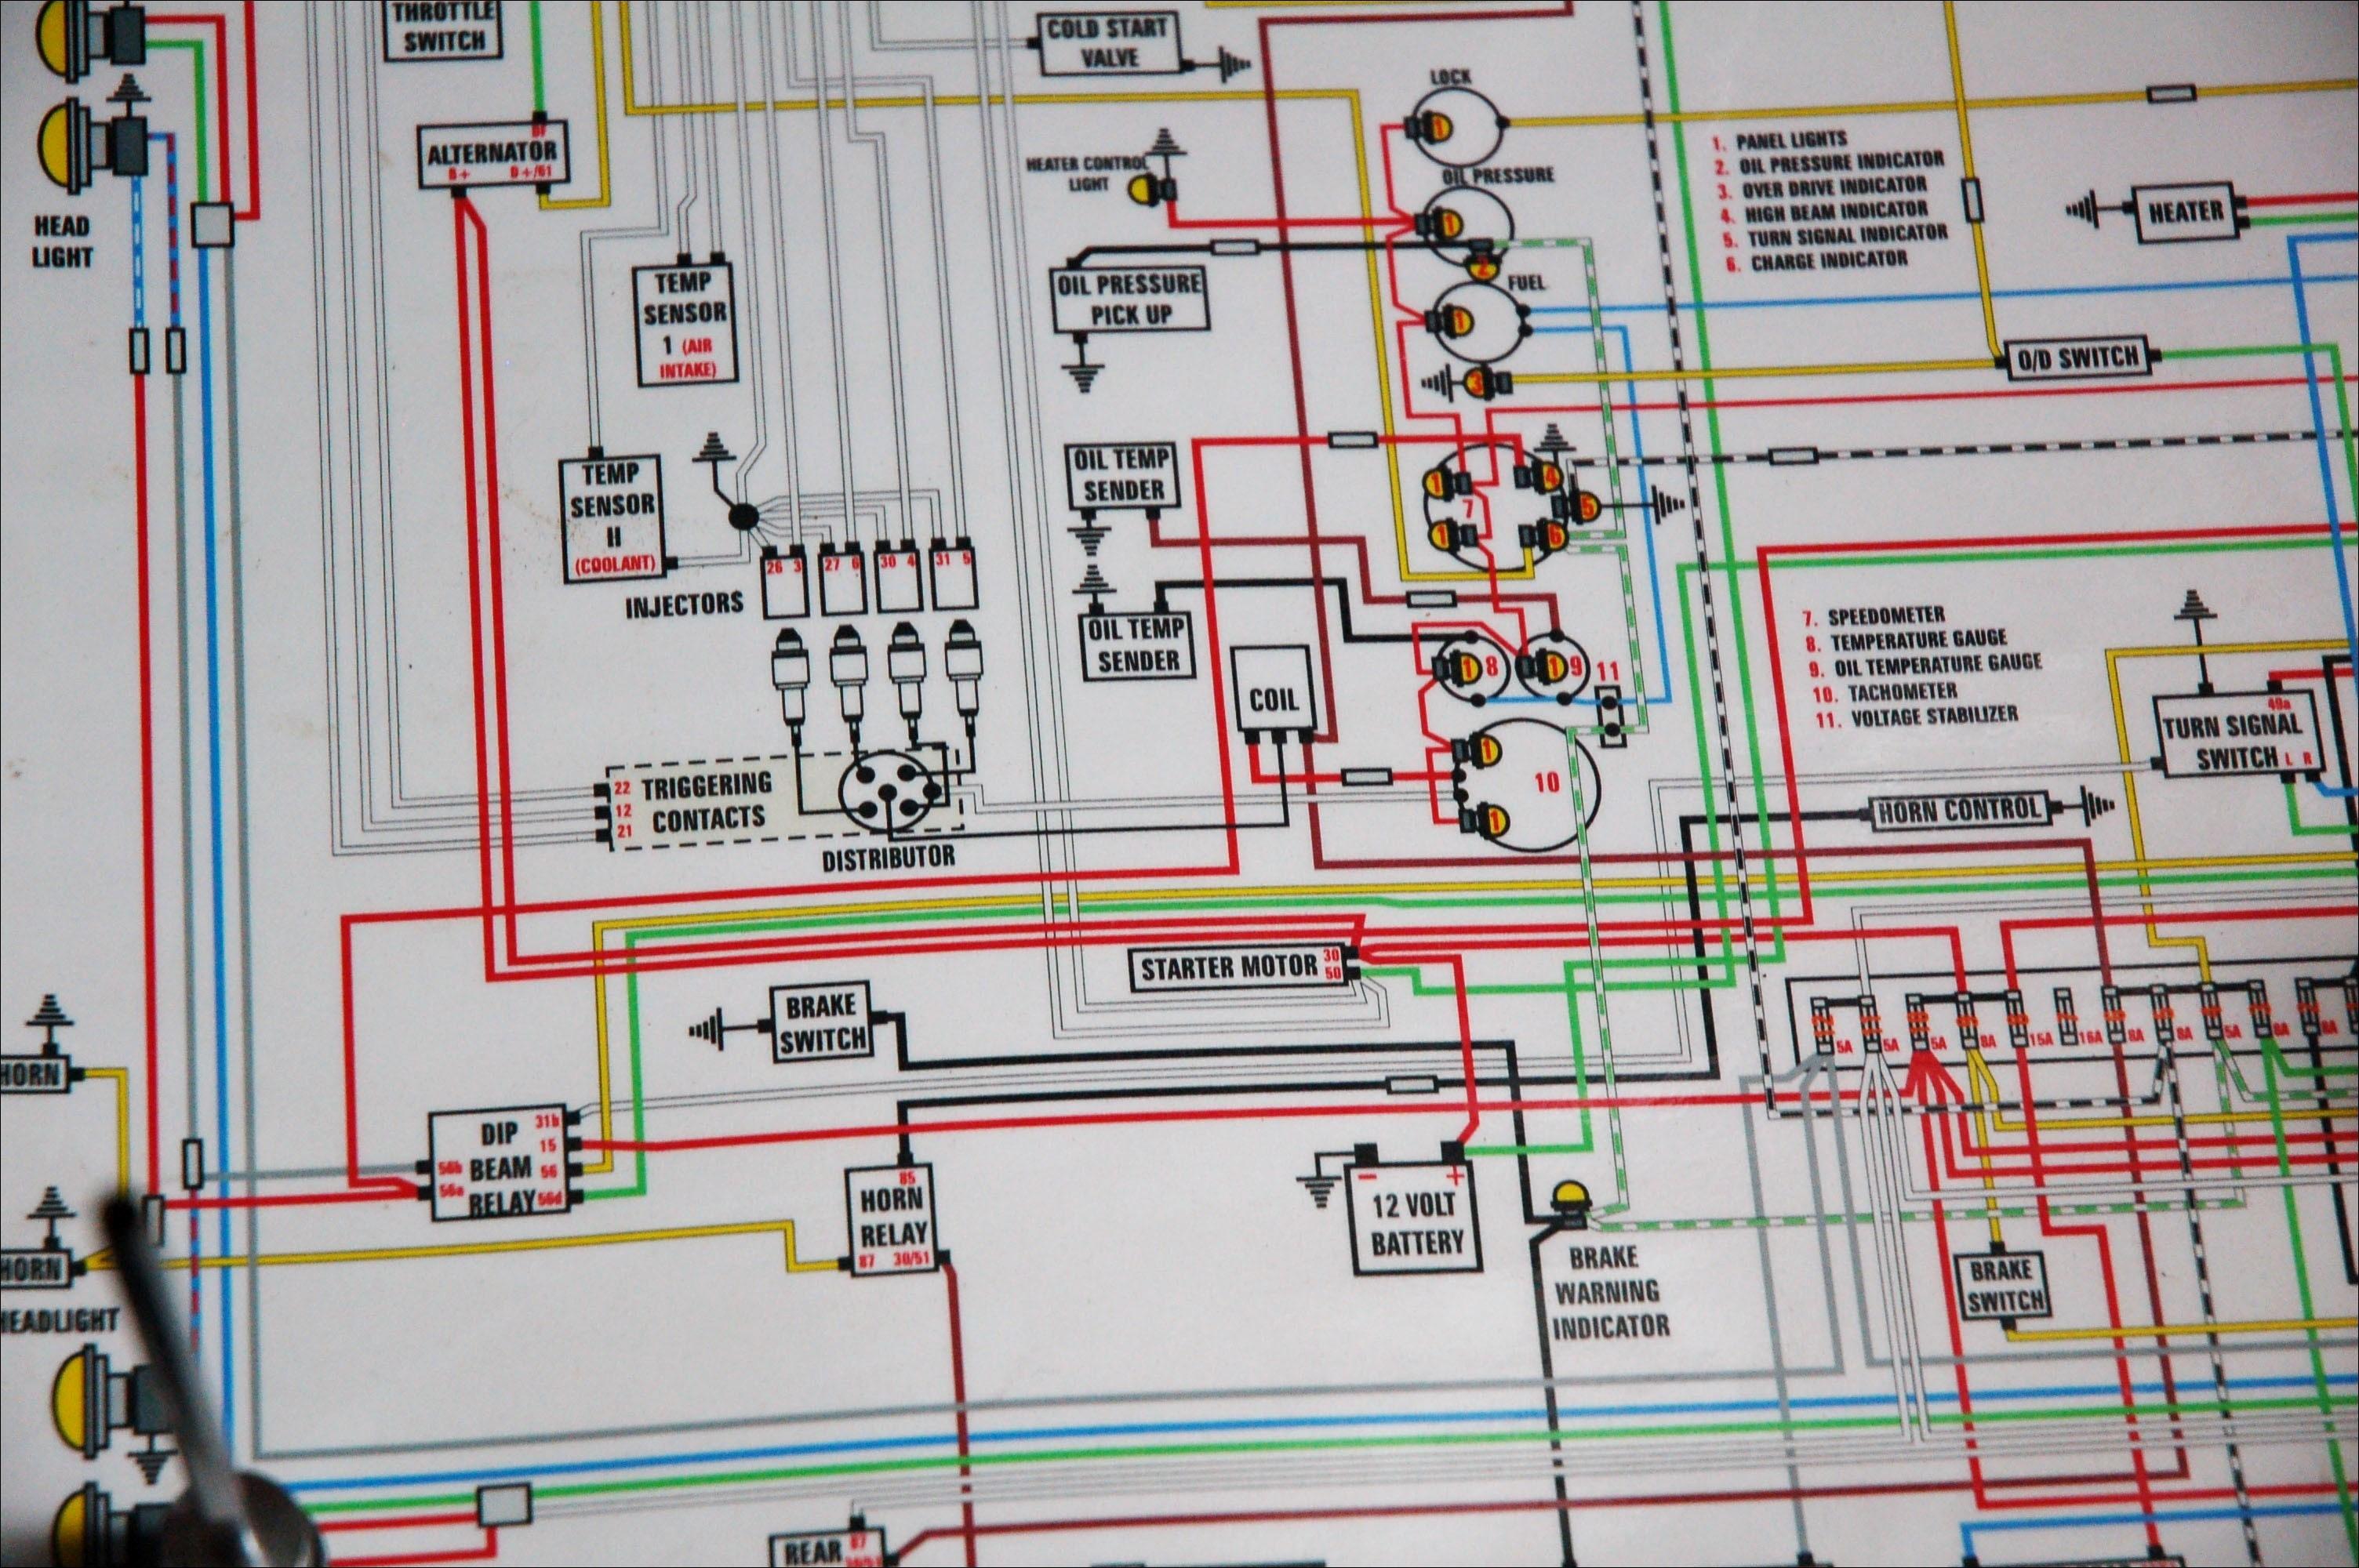 1969 Chevelle Wiring Diagram Painless Wiring Diagrams Worksheet and Wiring Diagram • Of 1969 Chevelle Wiring Diagram